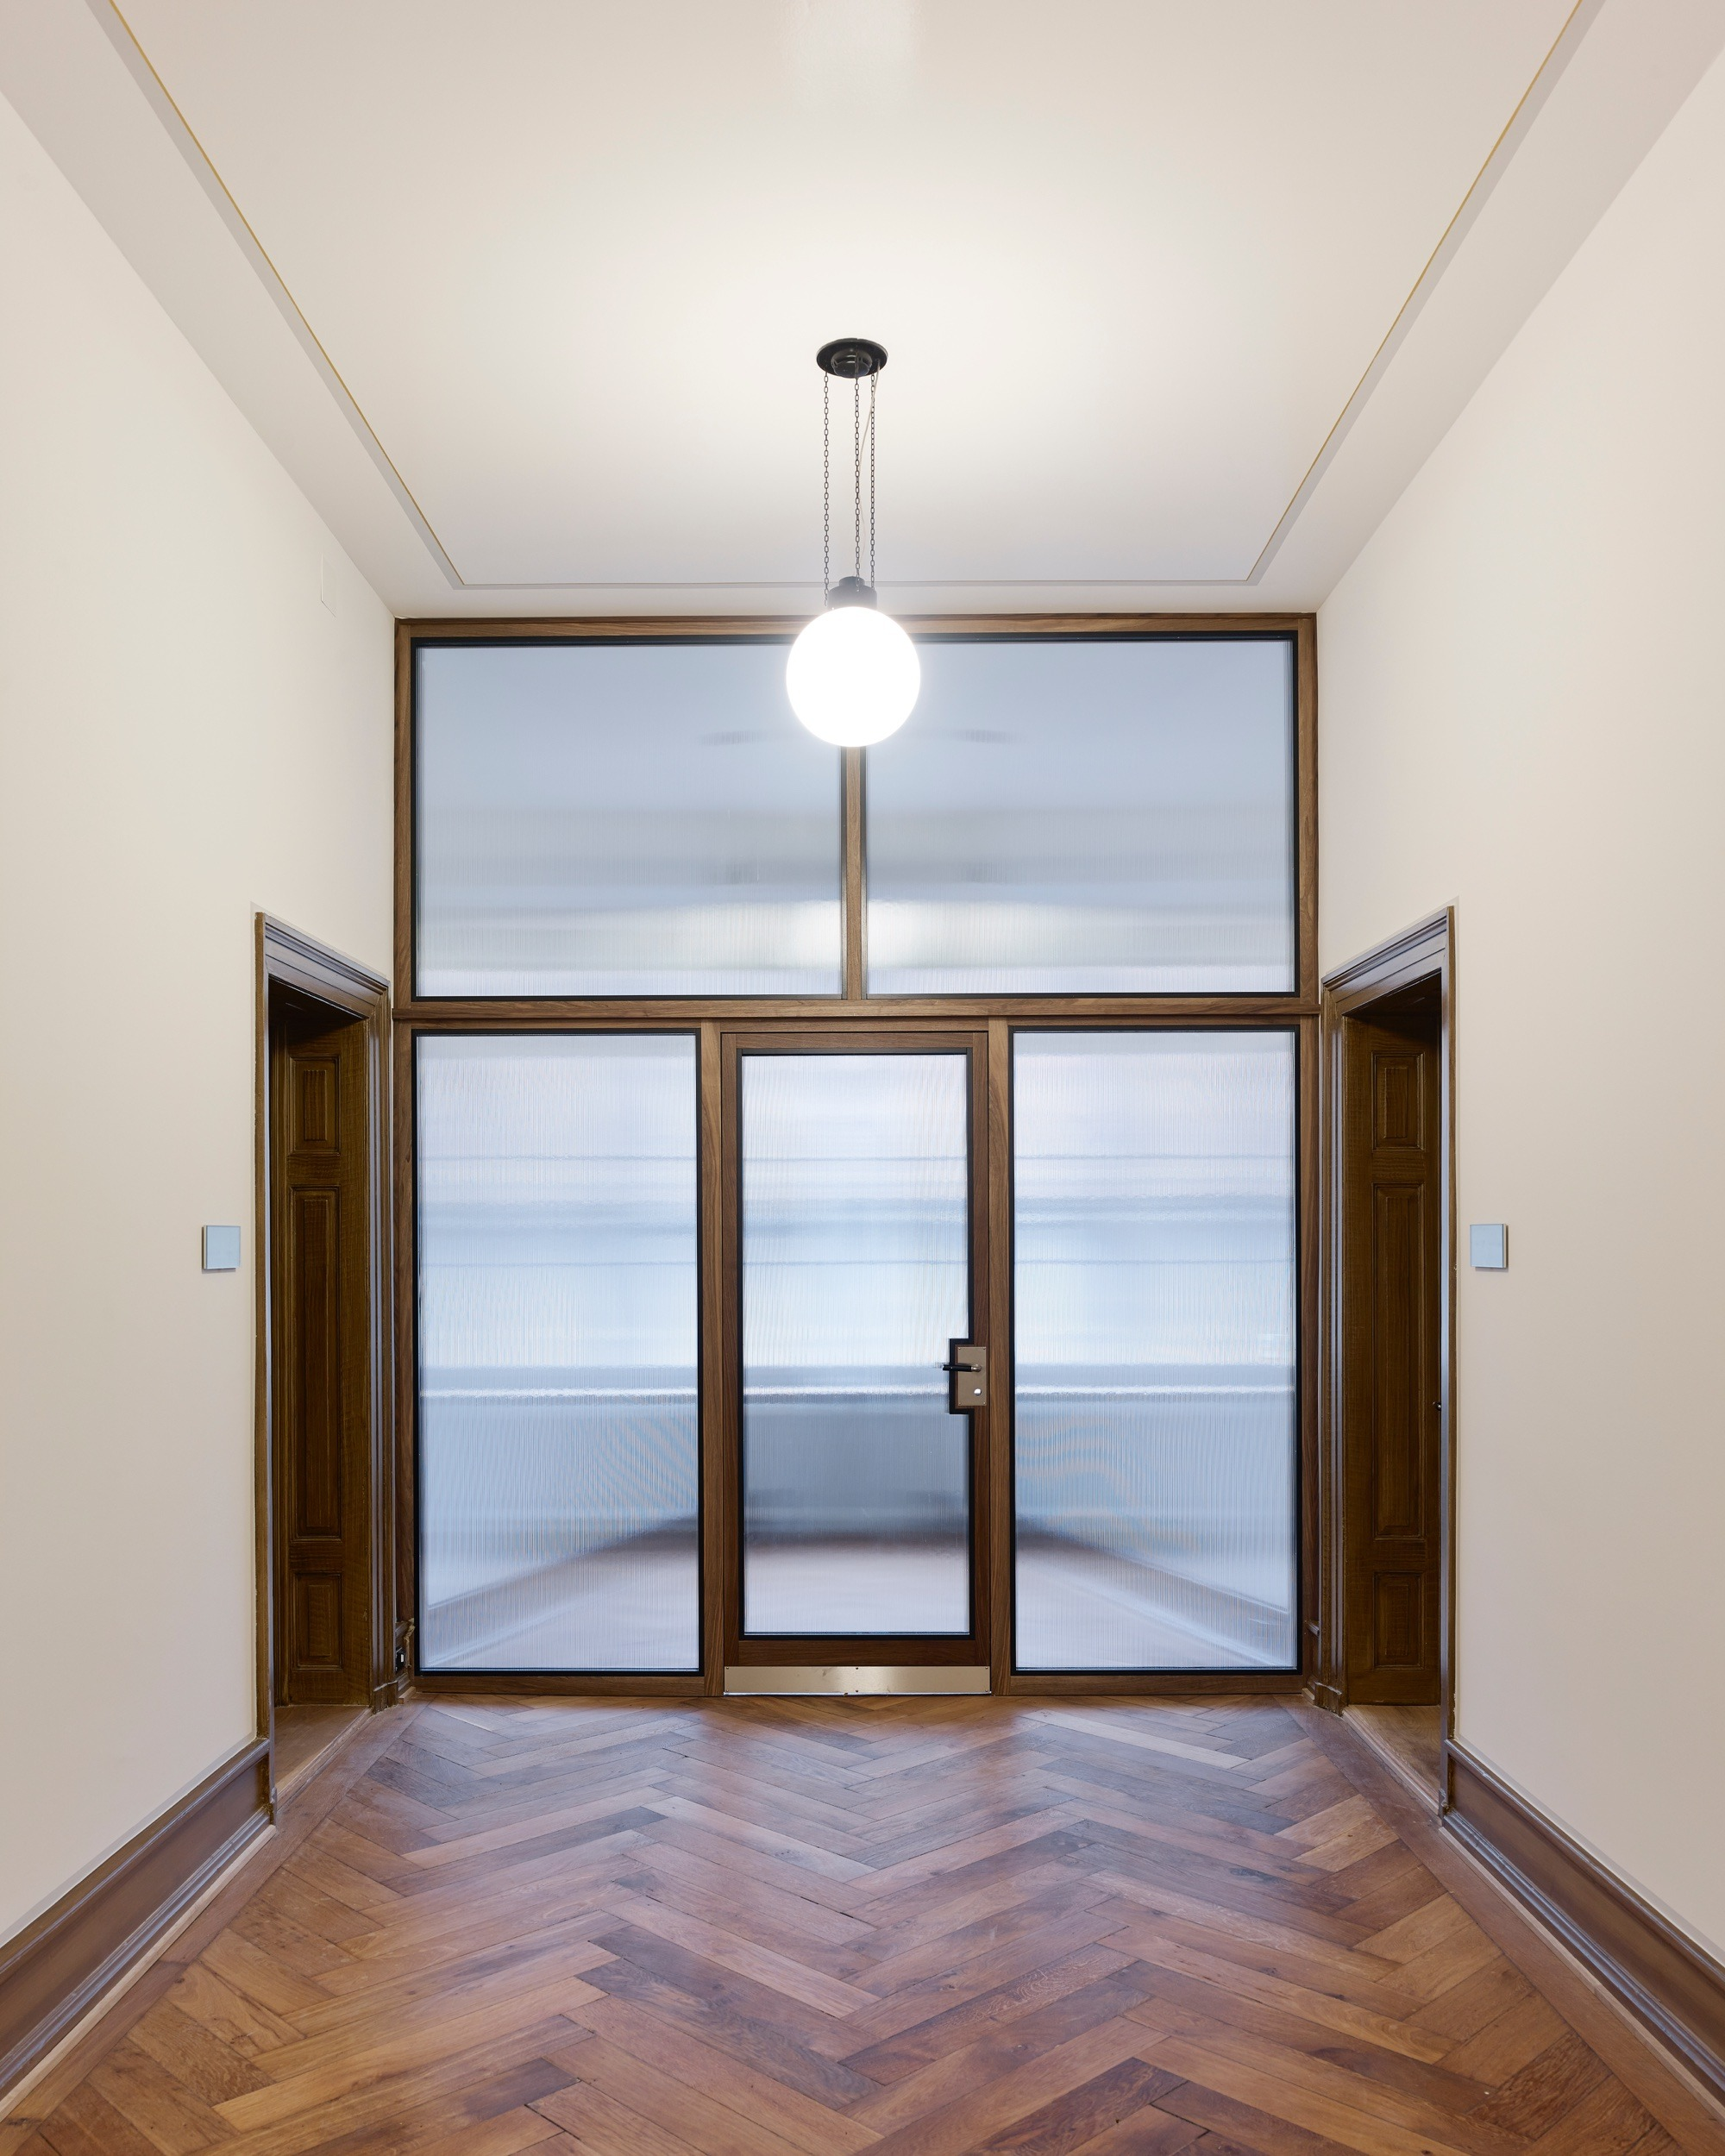 Fenstertuere_Framestar_Regierungsgebaeude_Frauenfeld_01